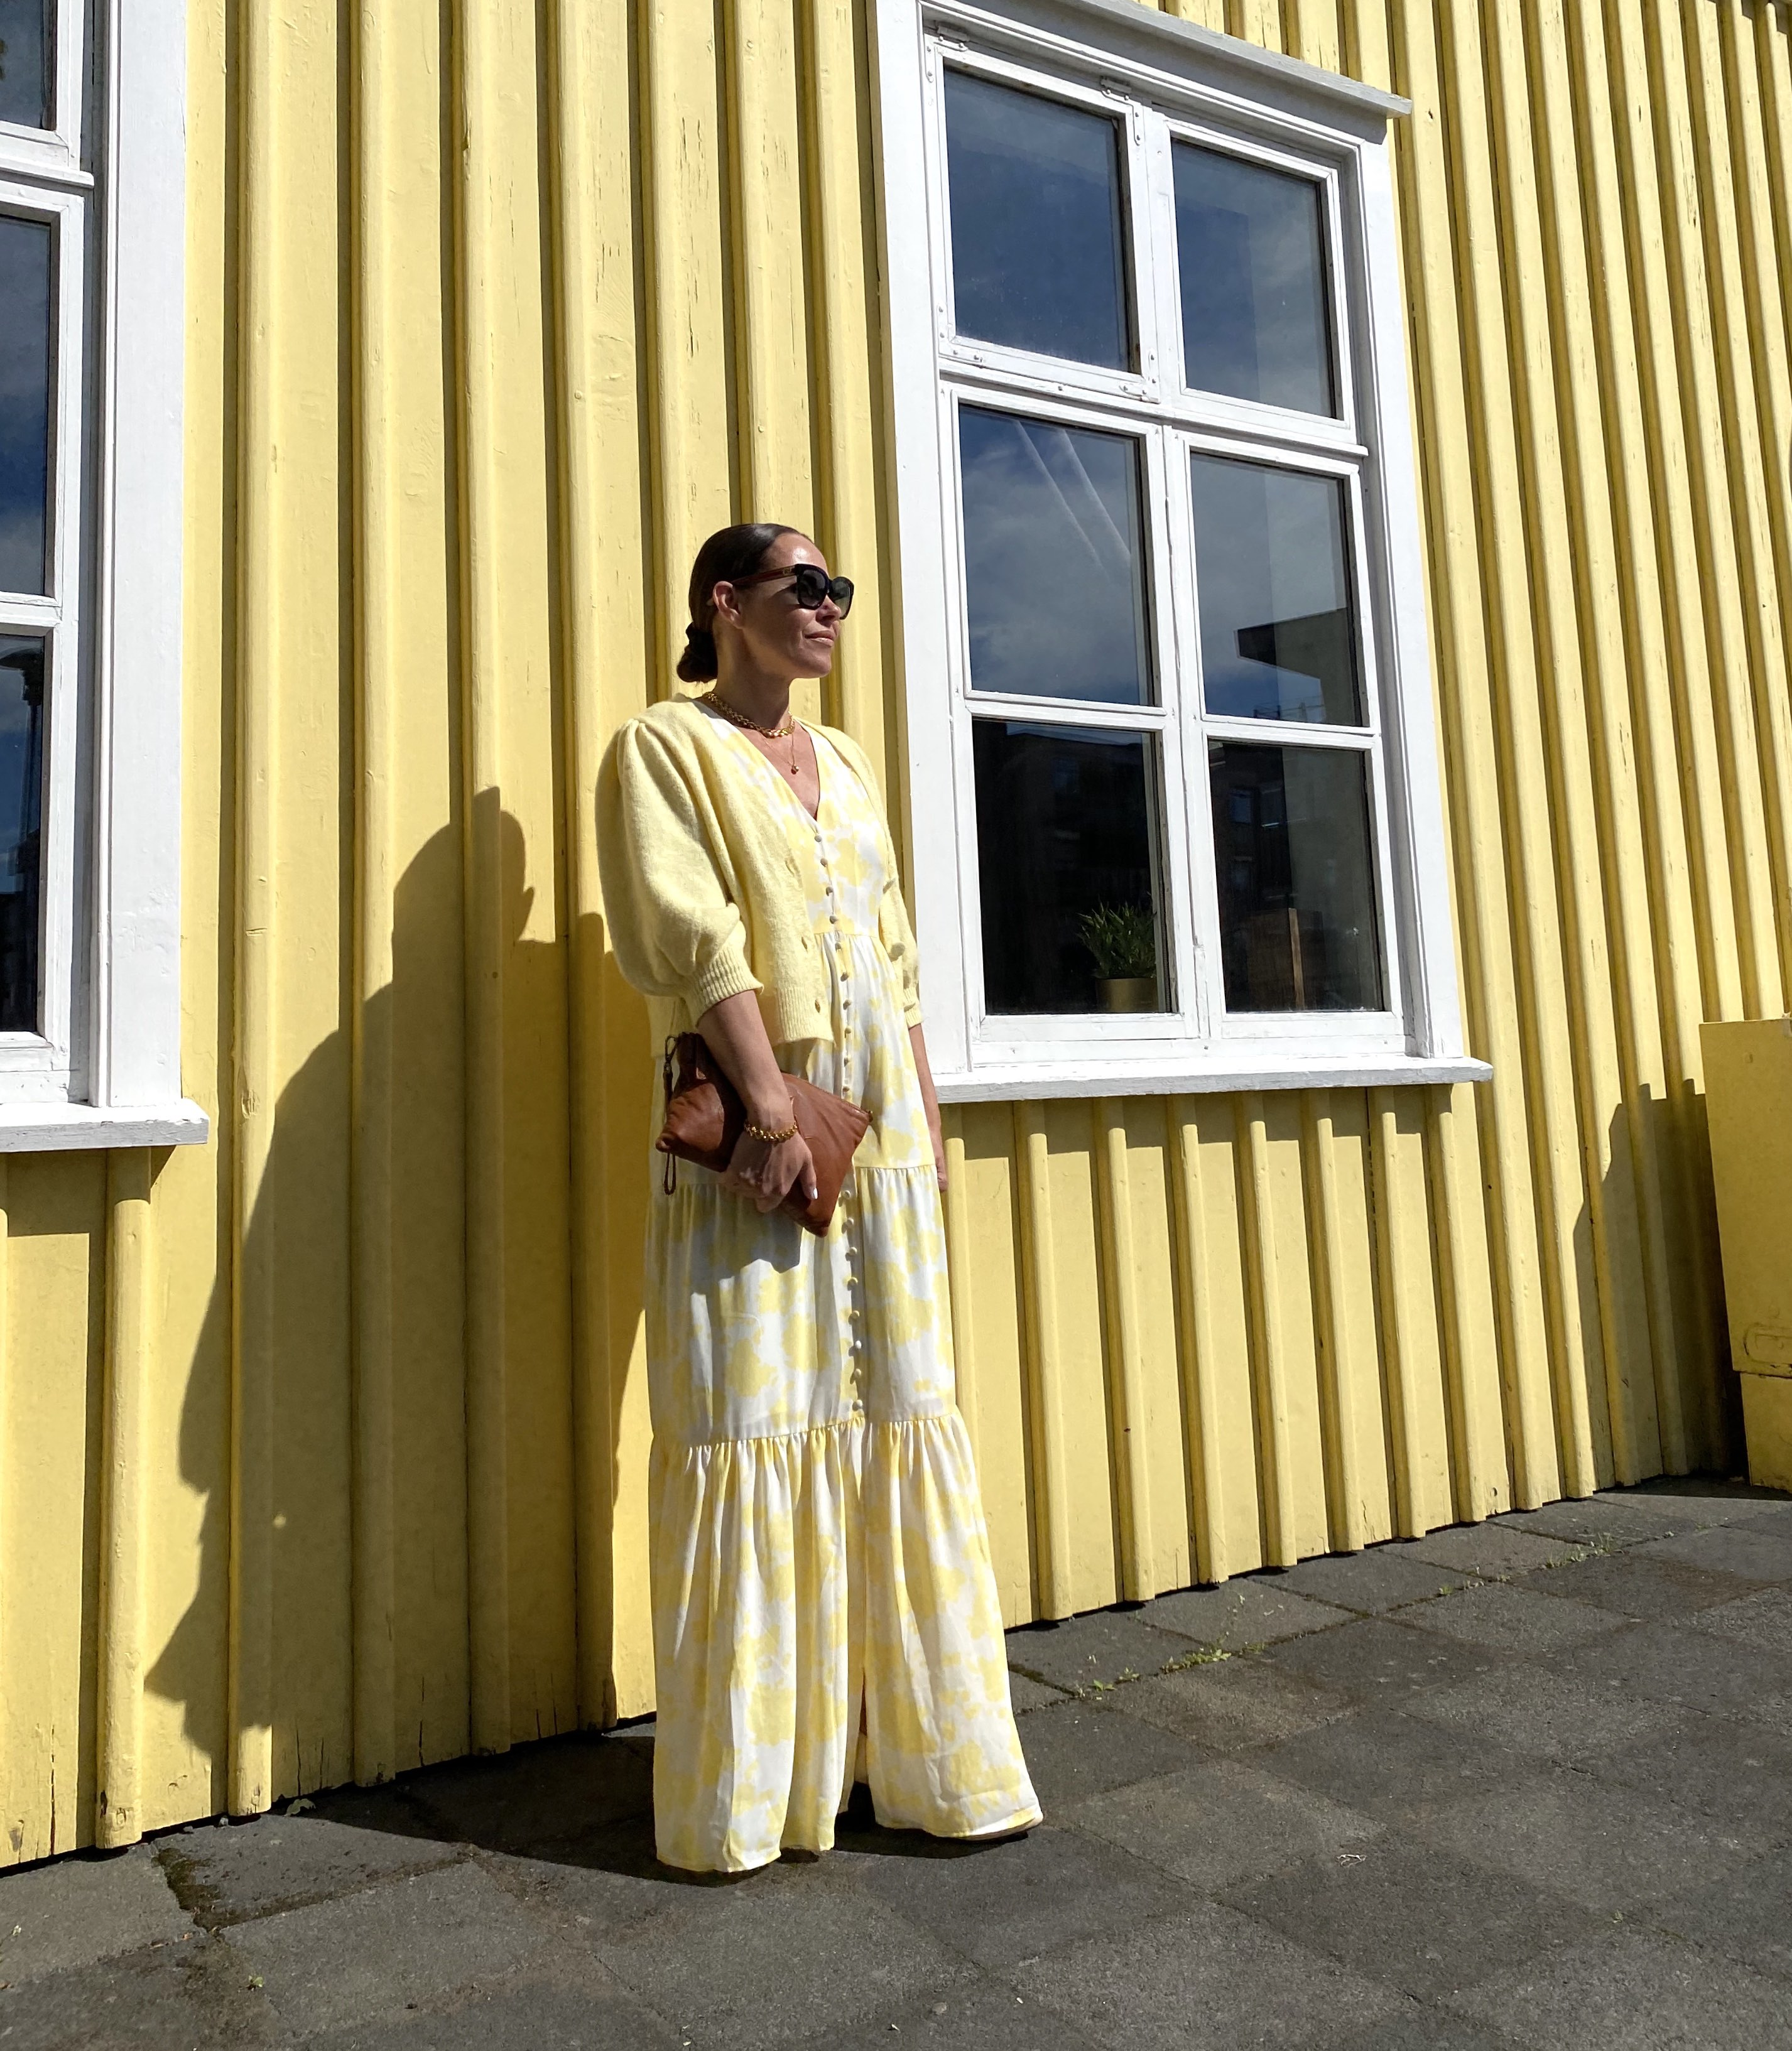 DRESS: YELLOW